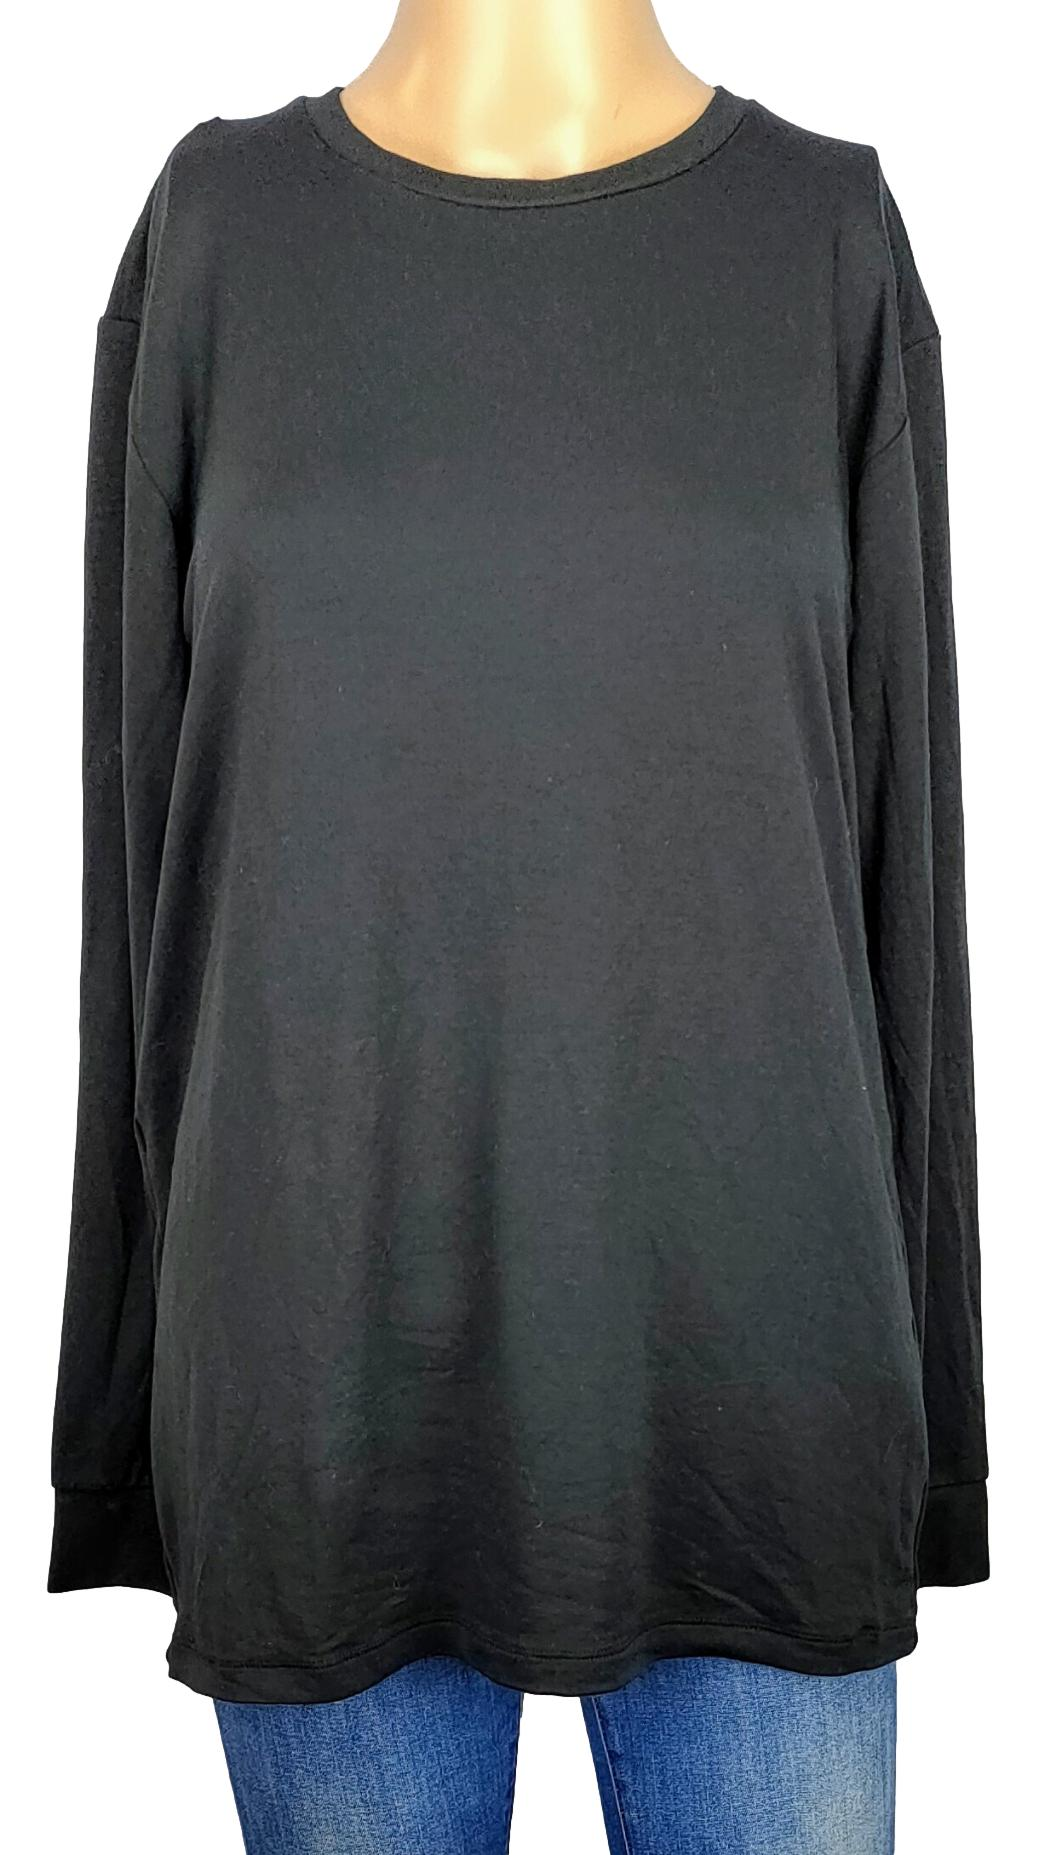 T-Shirt Uniqlo - Taille L